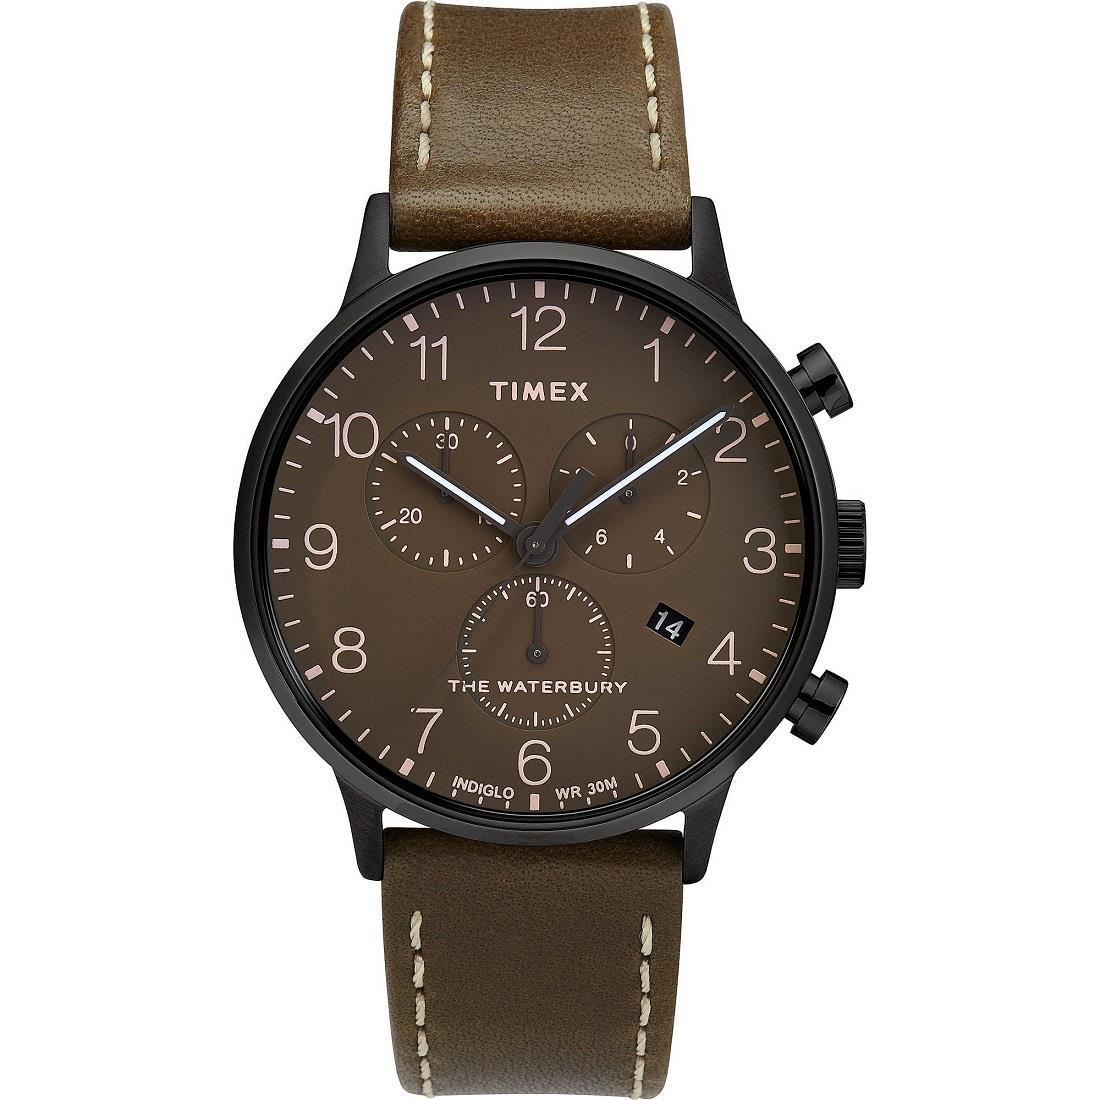 Orologio uomo cassa 40 mm - TIMEX